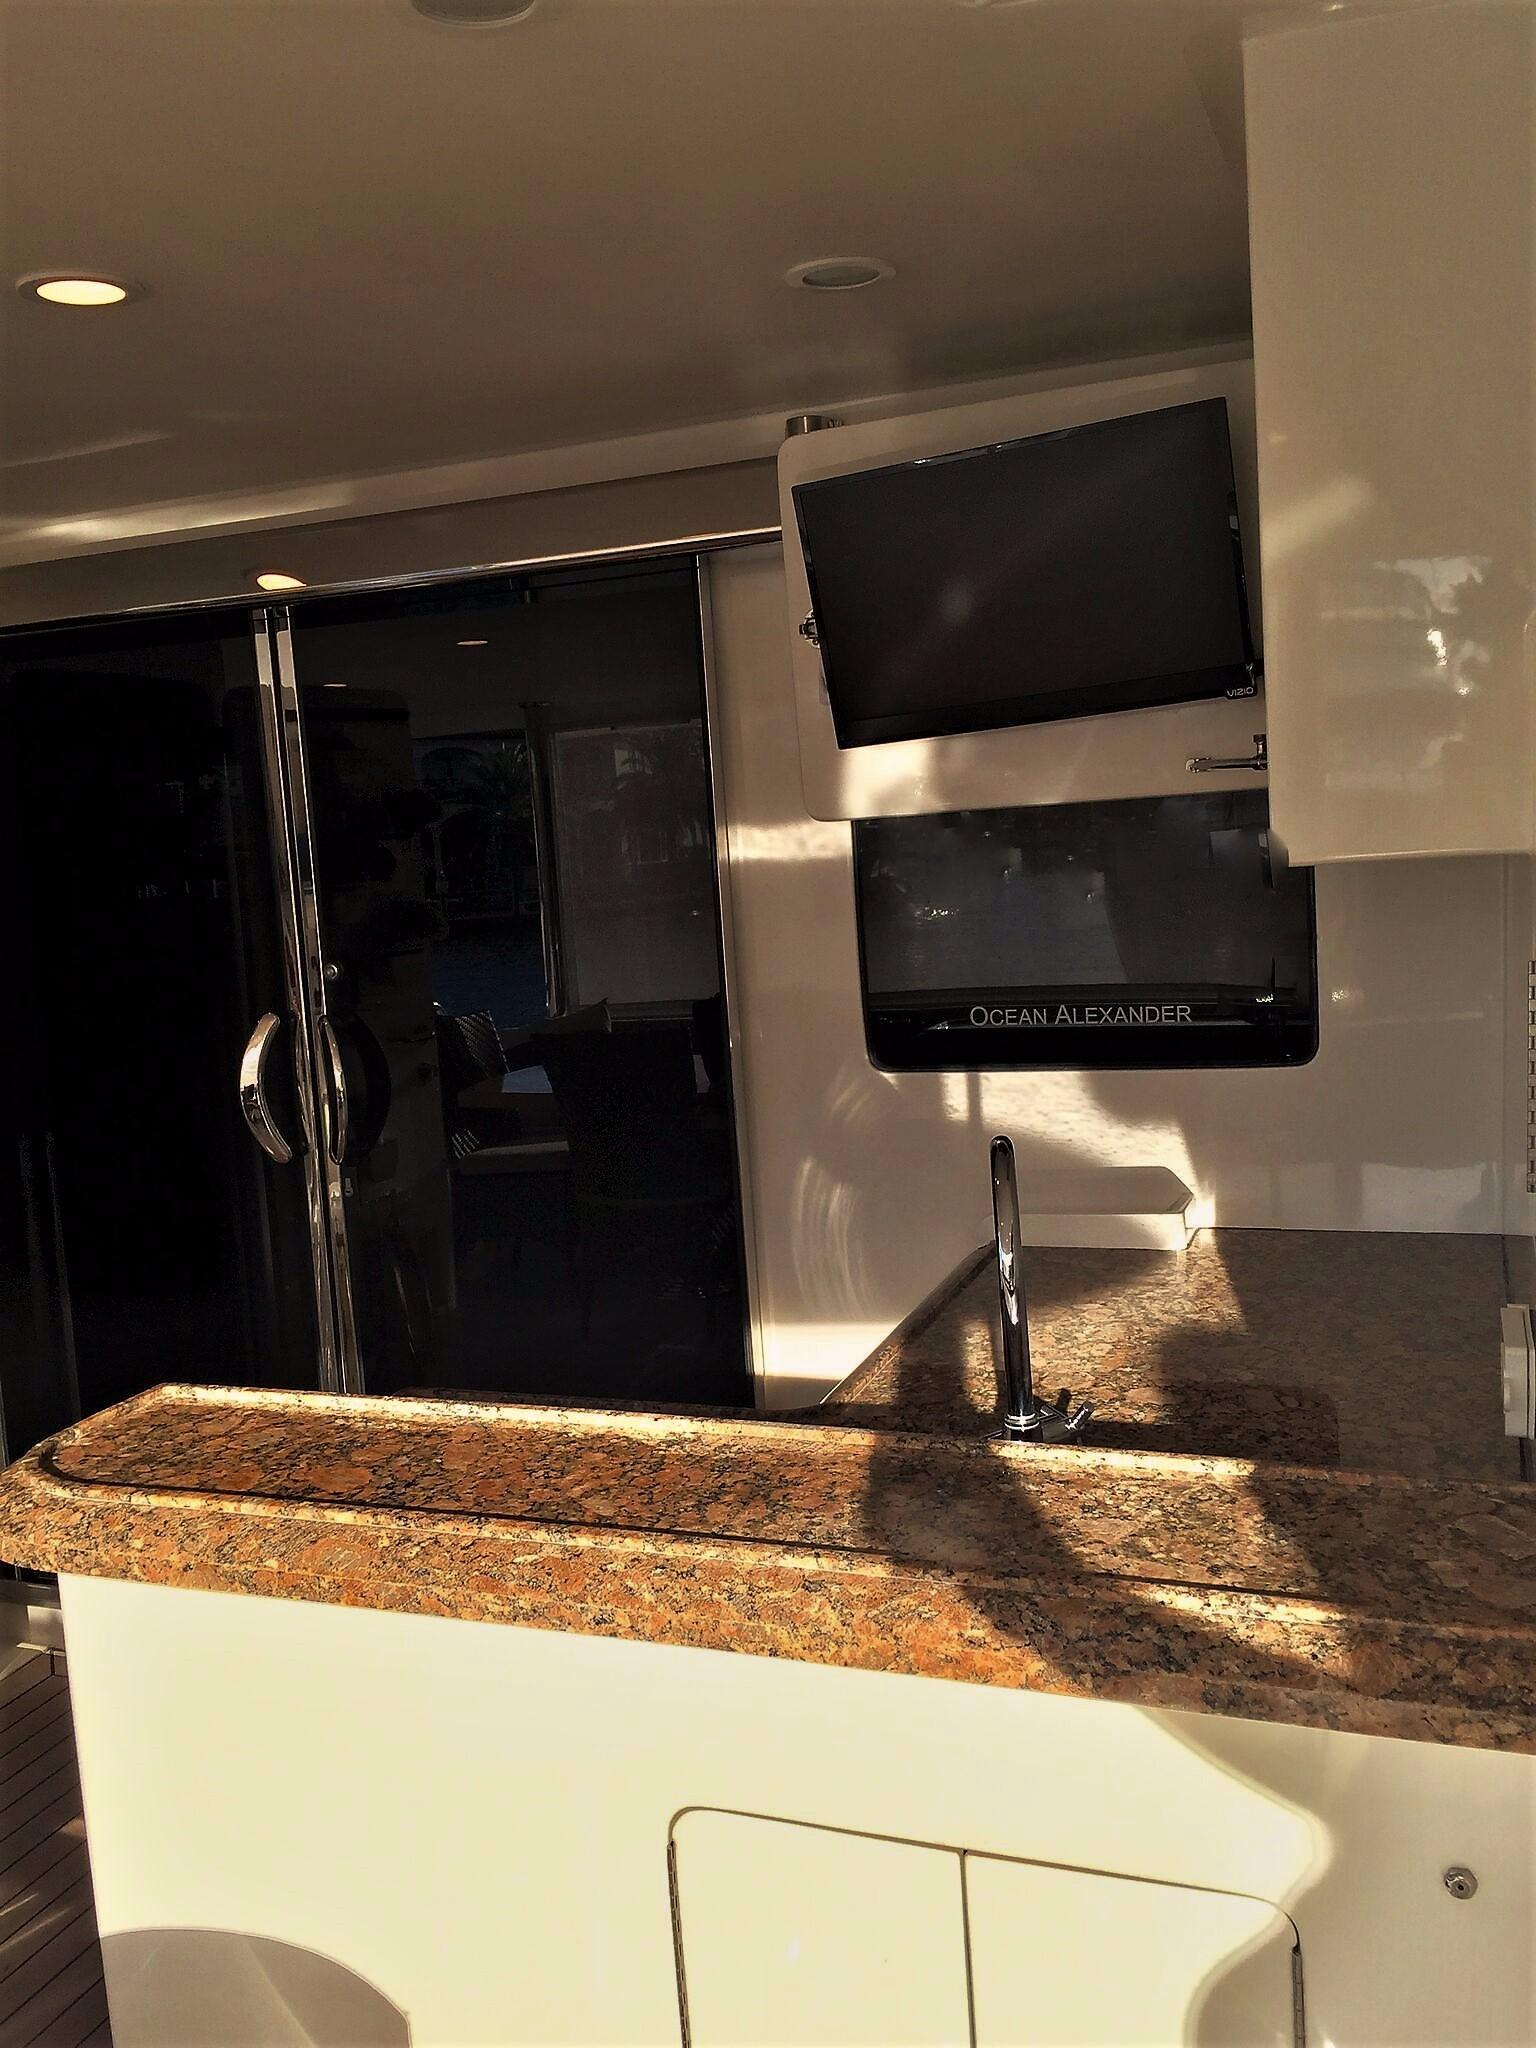 Aft Deck Wet Bar and TV